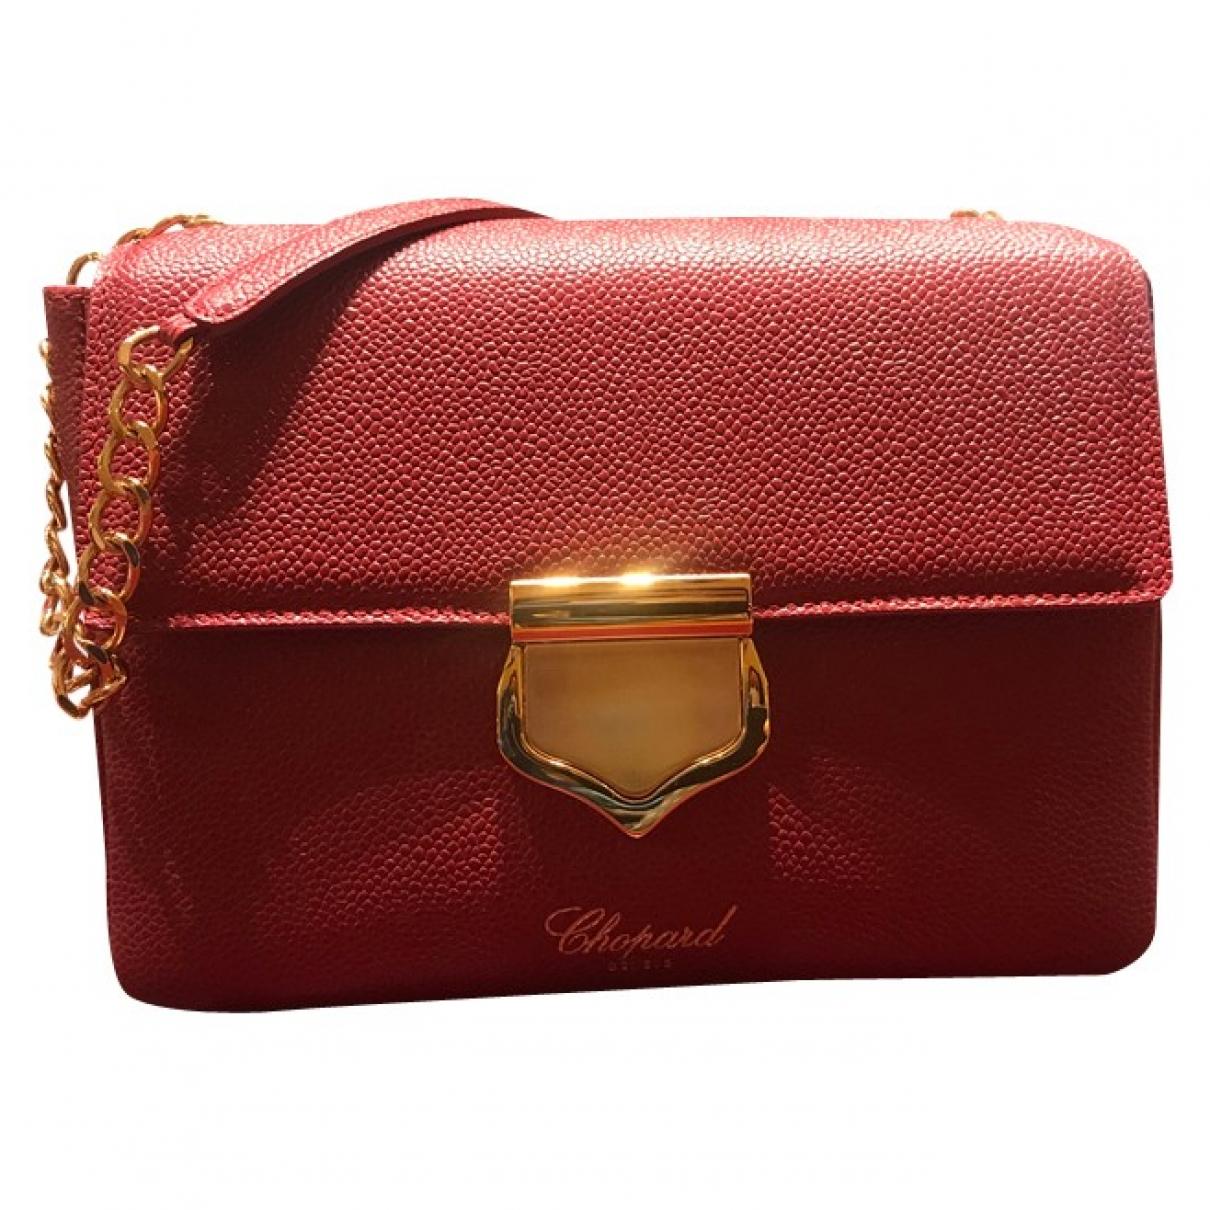 Chopard - Sac a main   pour femme en cuir - rouge